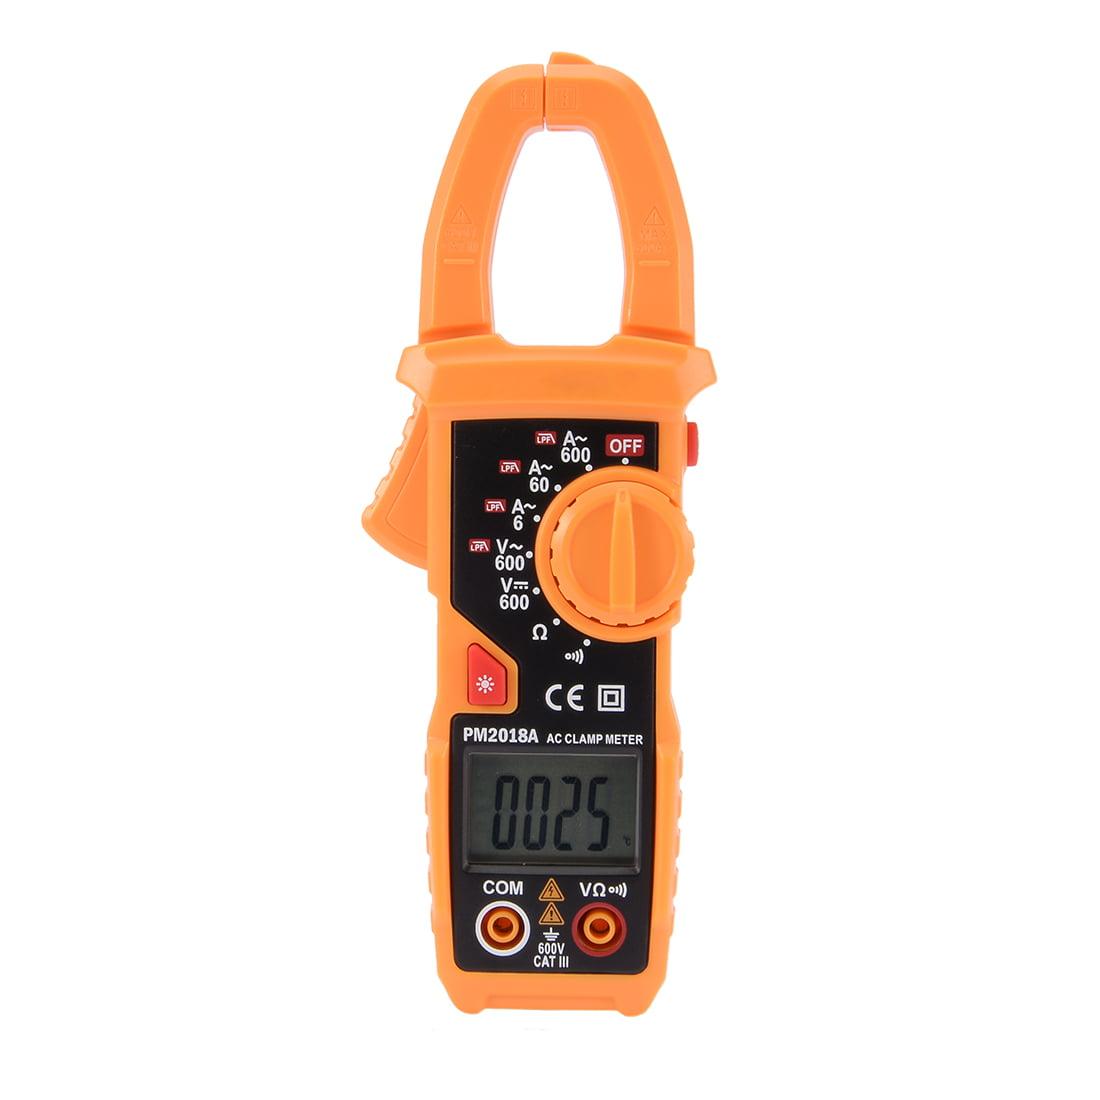 DMiotech PM2018A Digital Multimeter Ammeter Voltage Ohmmeter Clamp Meter Tester by